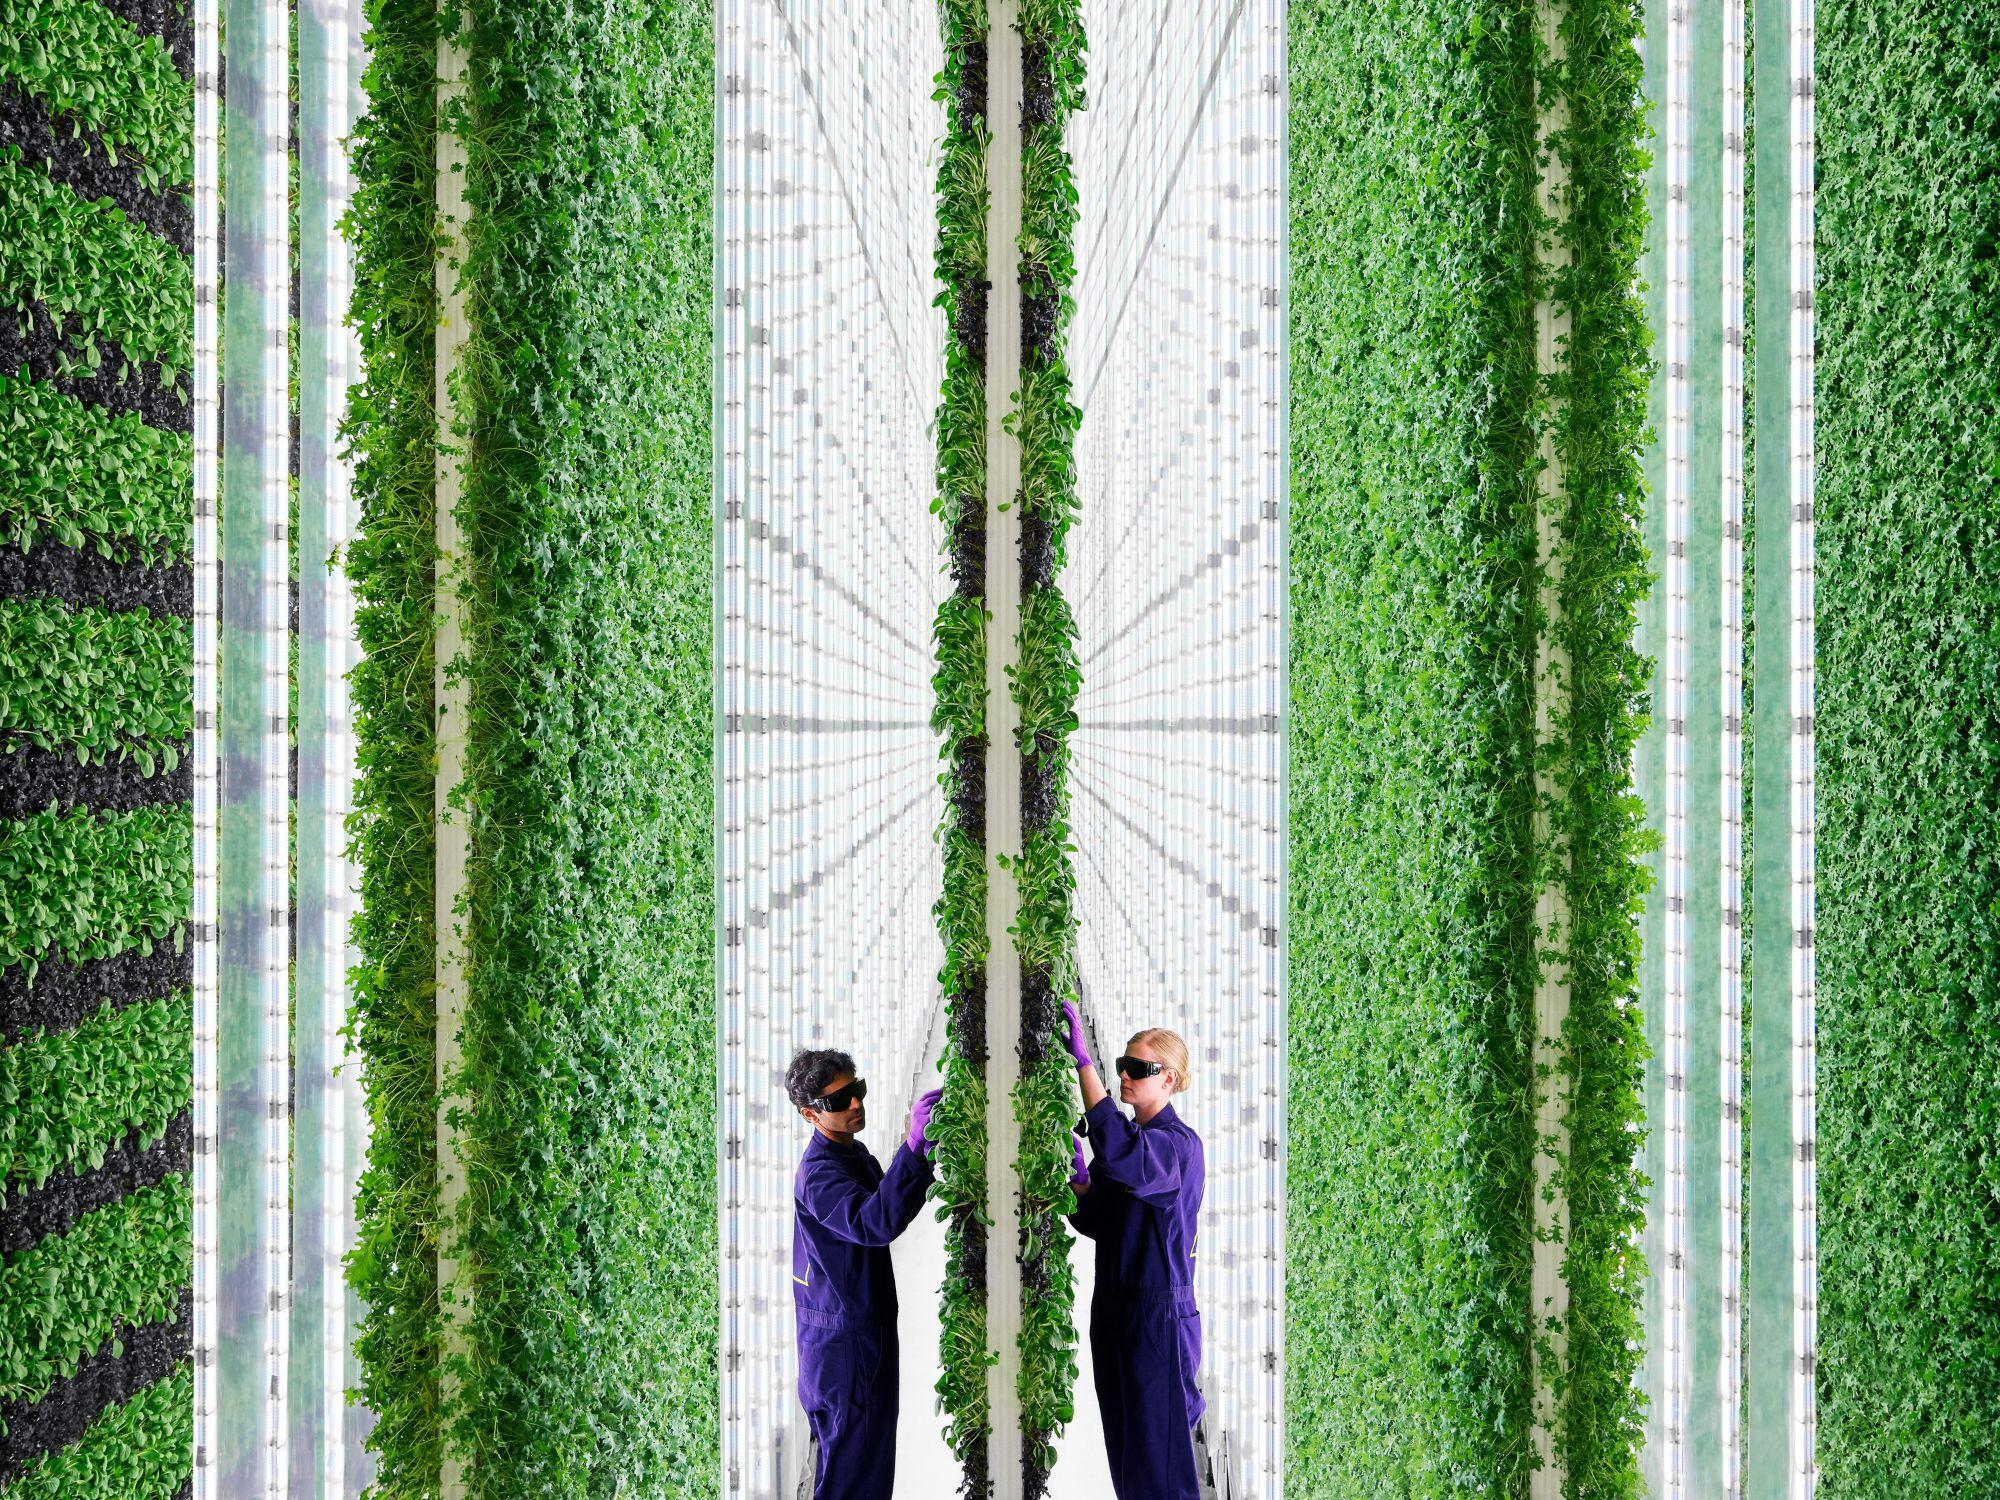 A photo of the Plenty indoor vertical farm in California